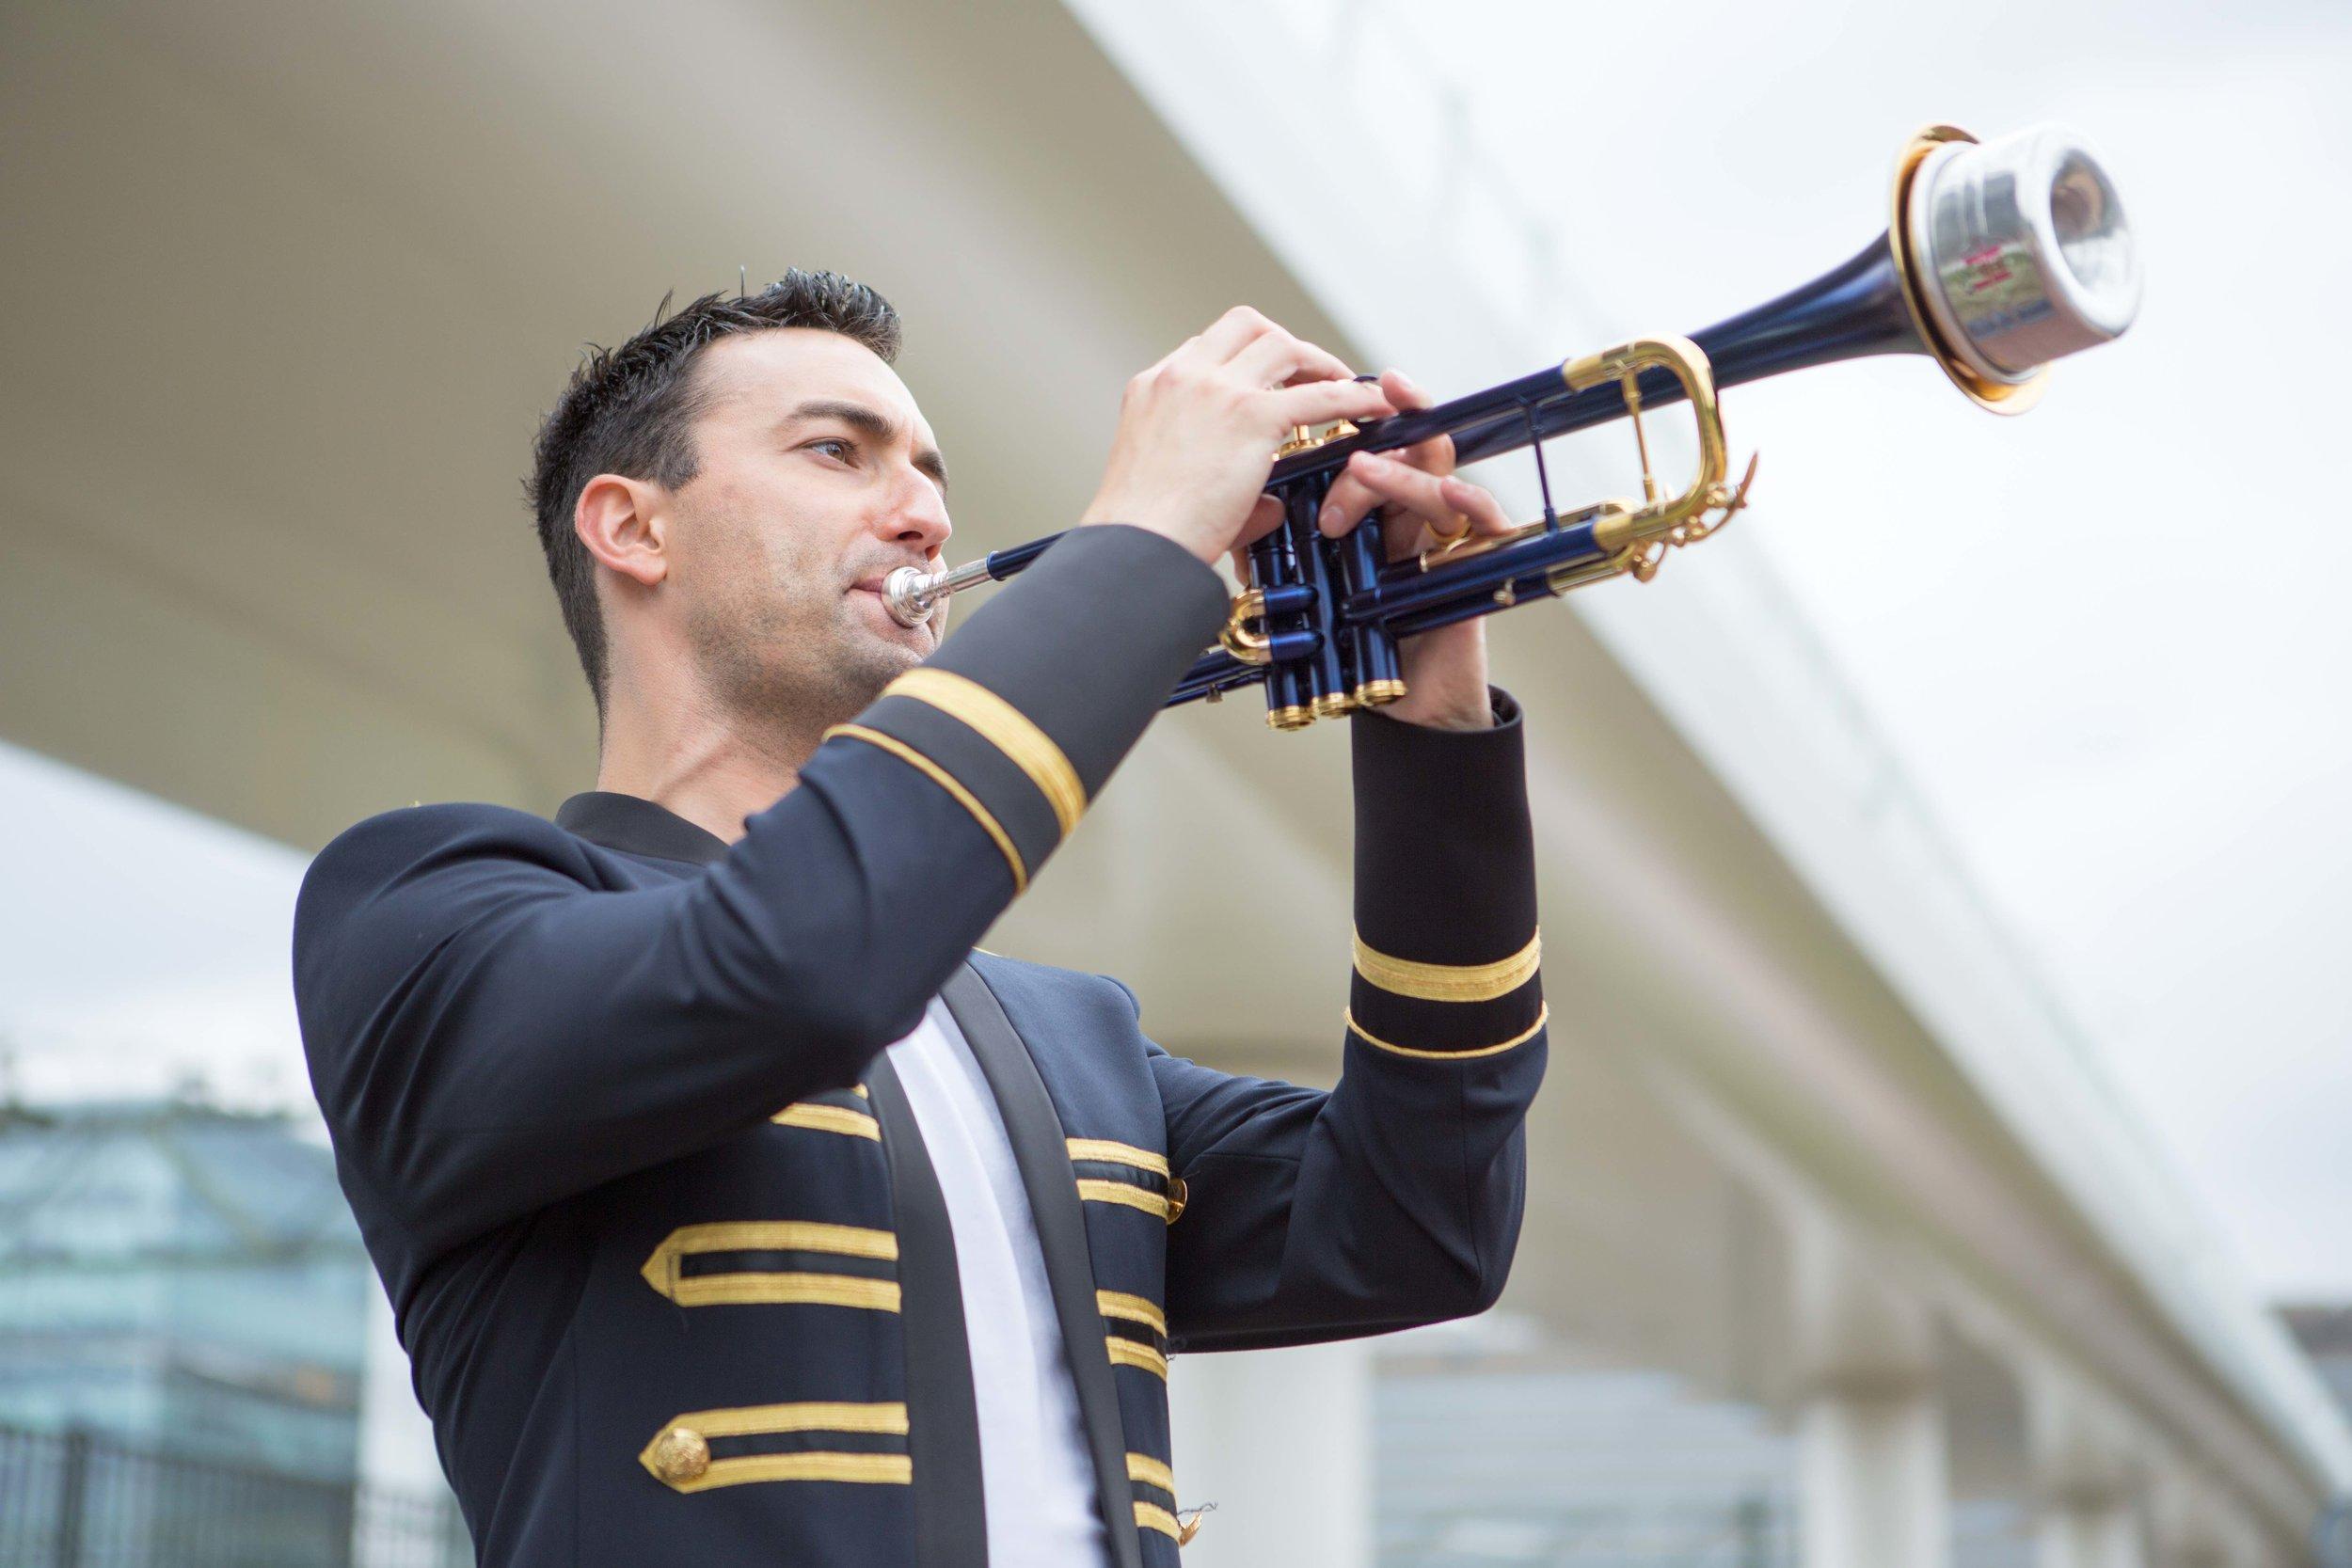 Rik Mol with 'Nieuwe Stradivarius' Adams trumpet